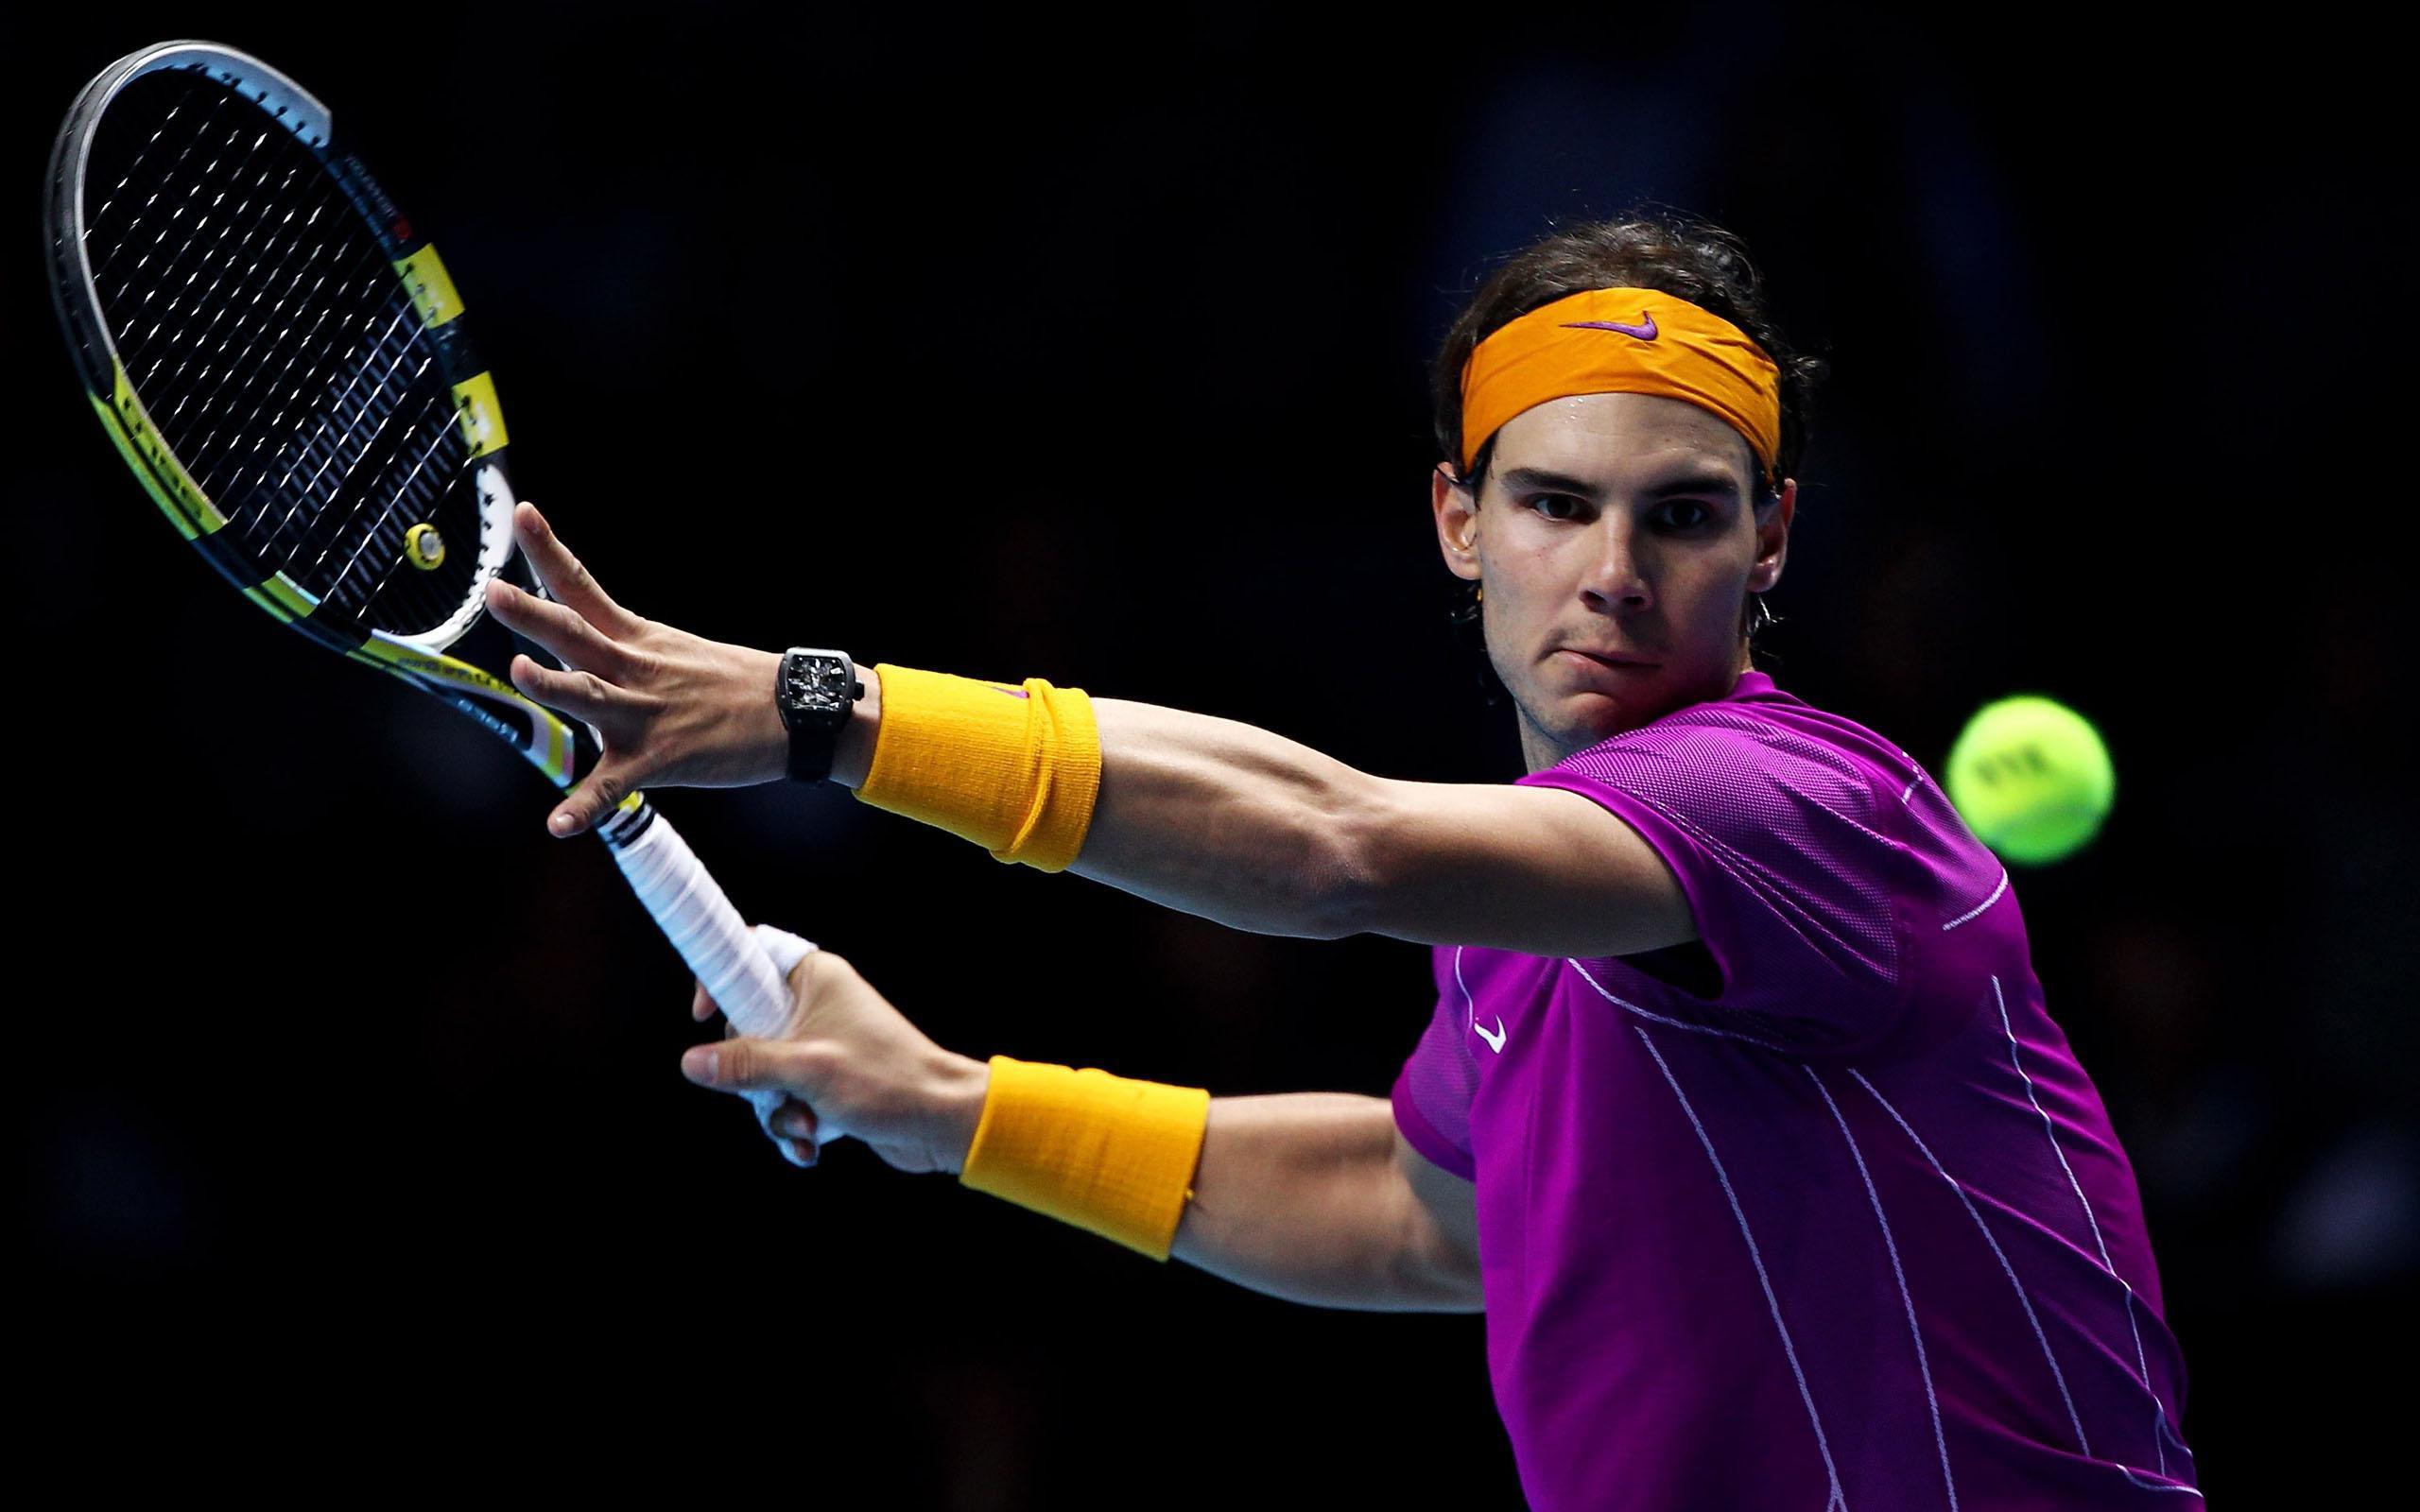 Sport Wallpaper Tennis: Tennis Wallpapers HD (57+ Images